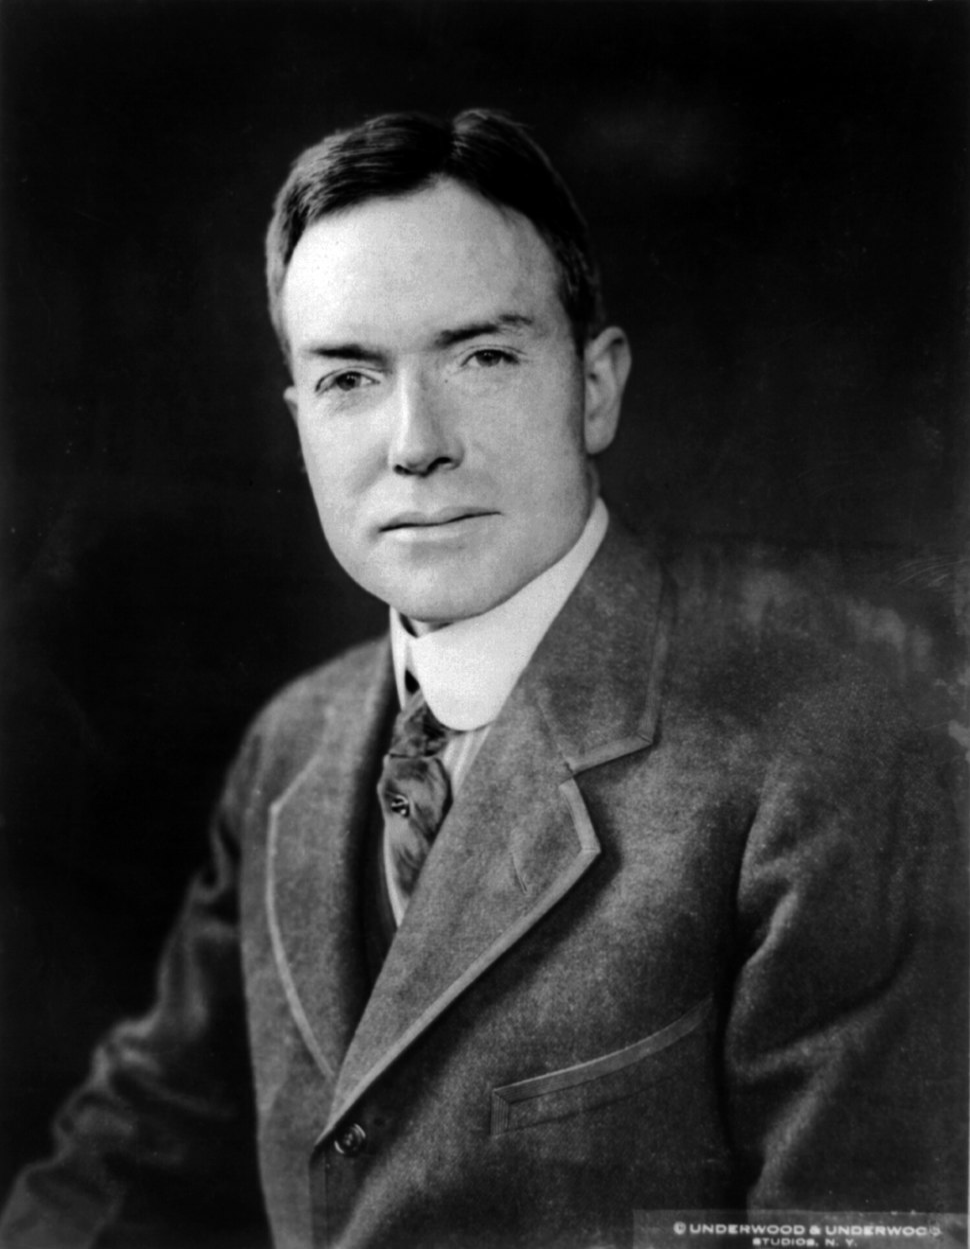 John D. Rockefeller Jr. cph.3a03736